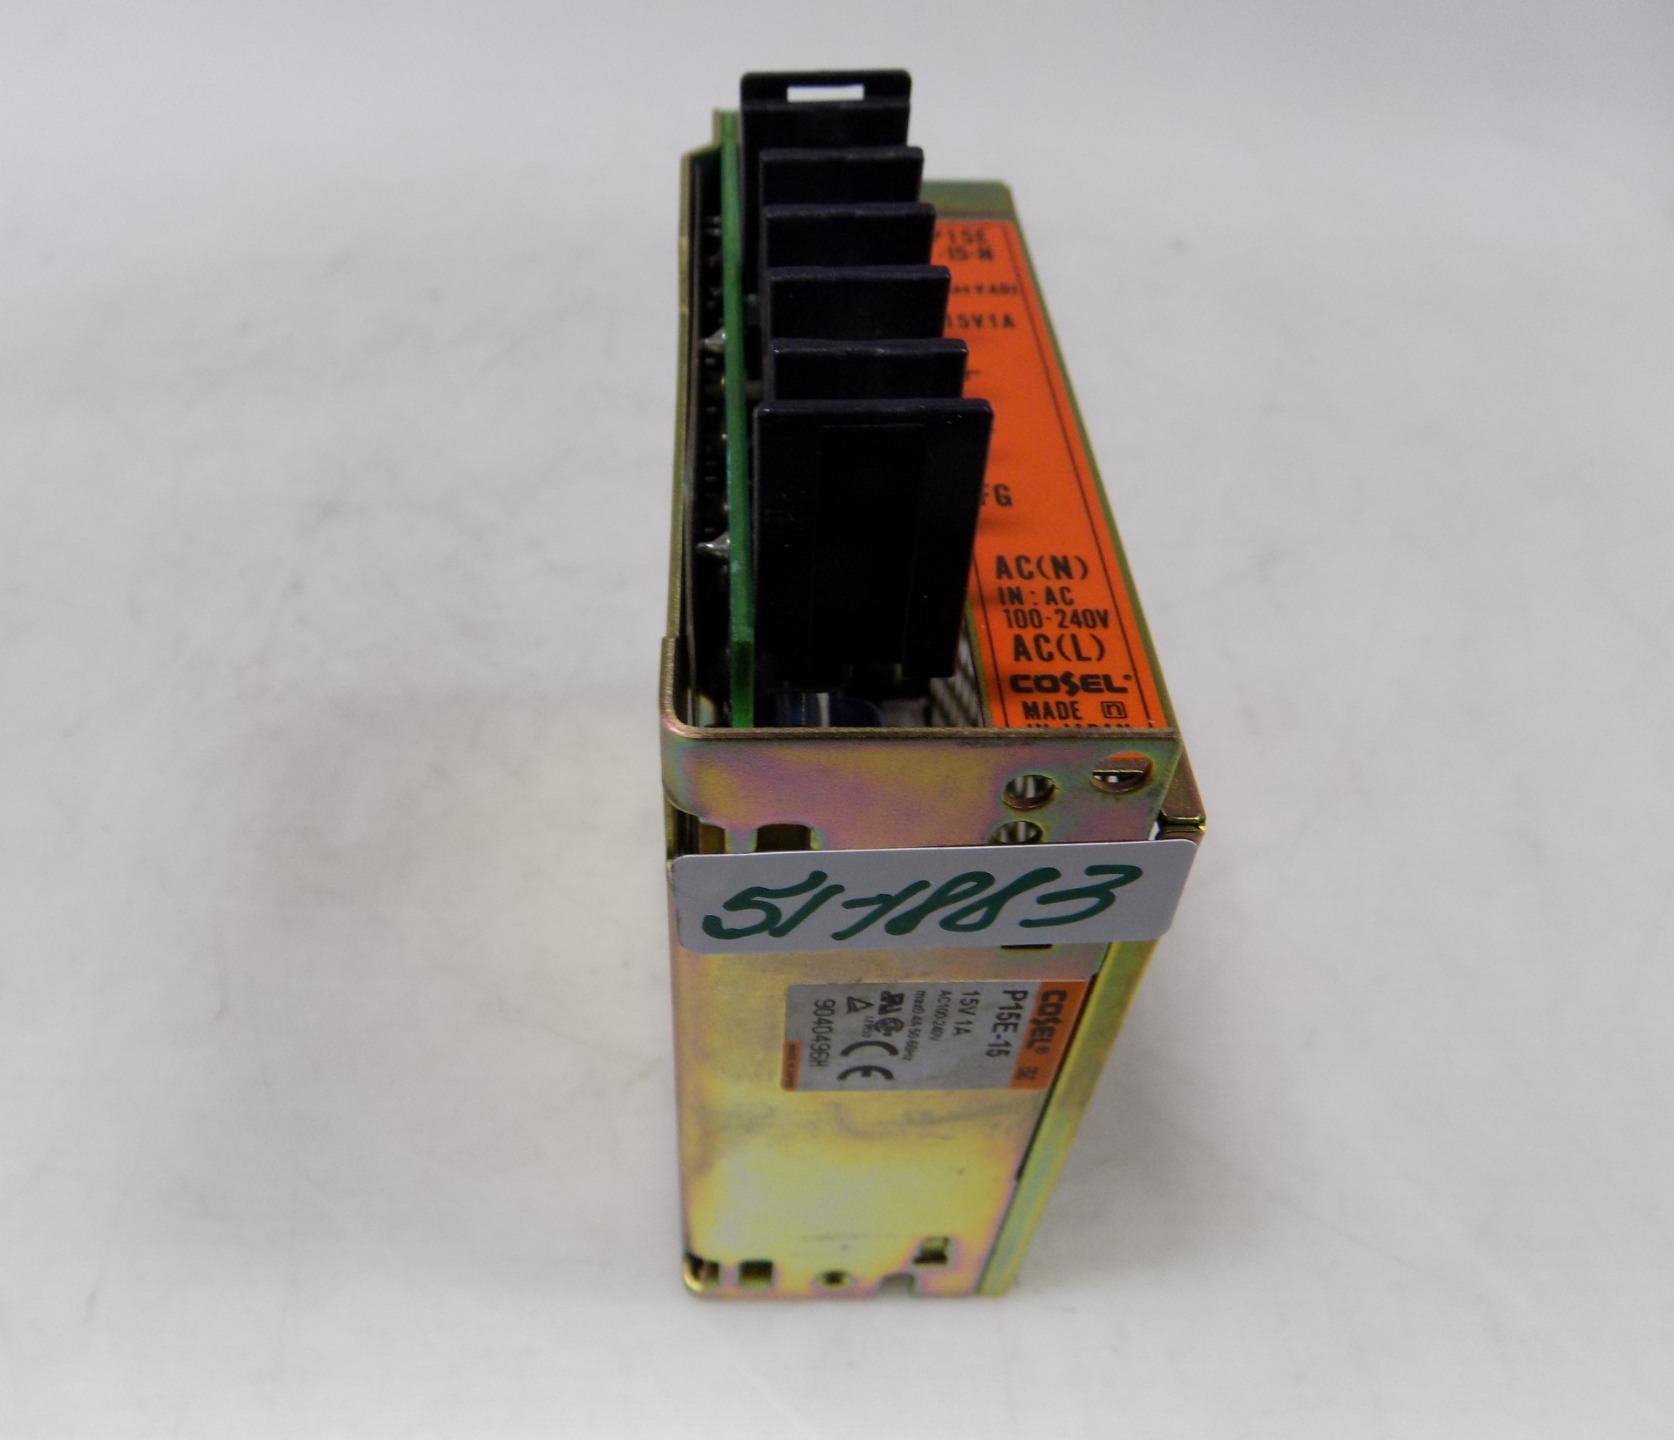 Cosel P15E-5 Power Supply AC100-240V #27A33